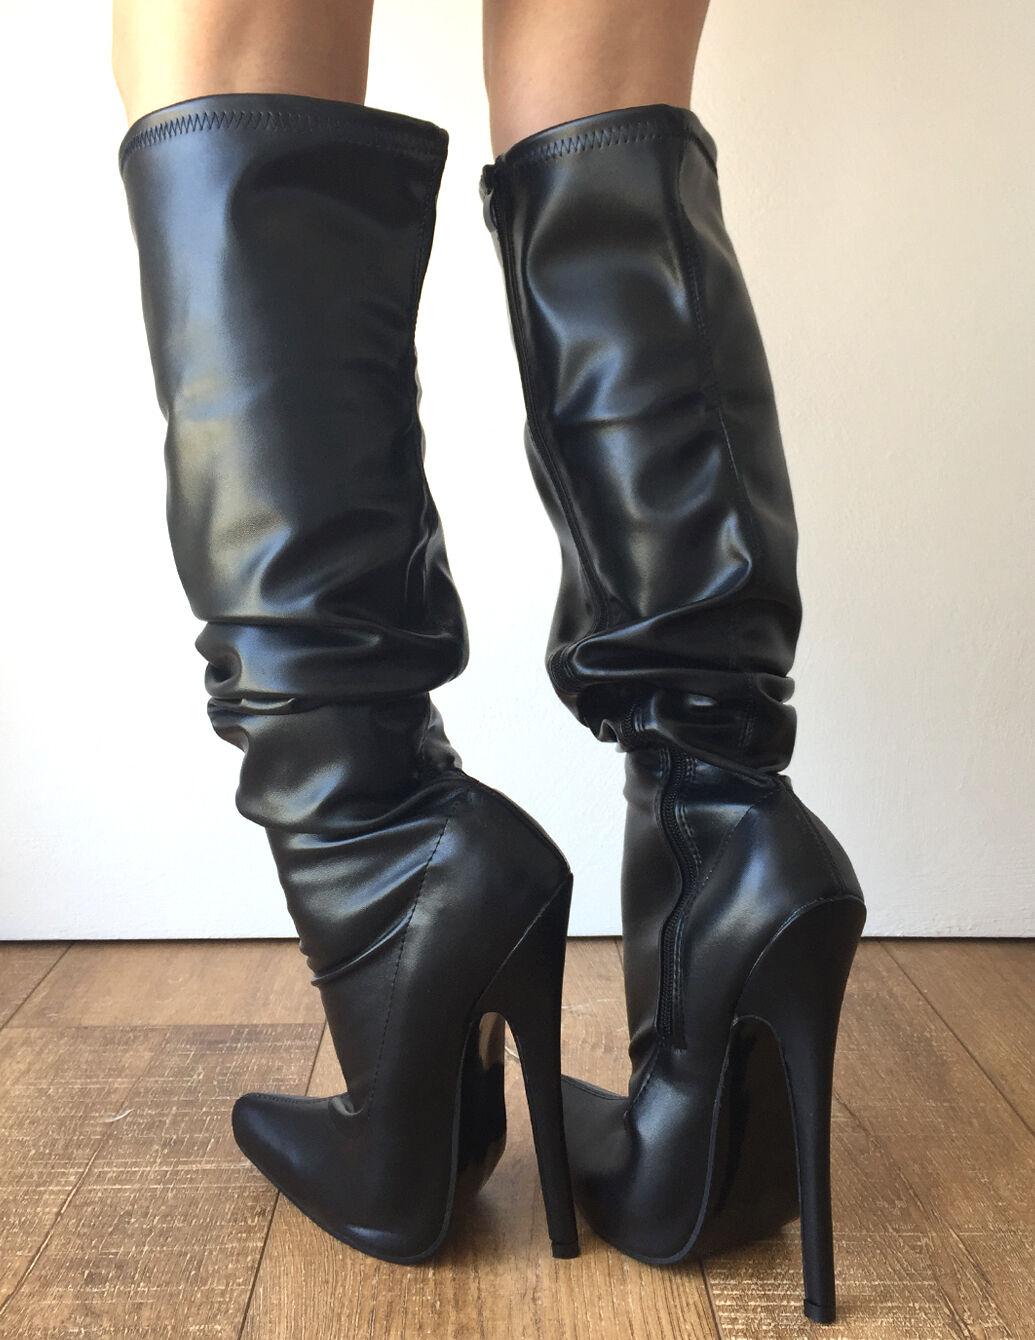 RTBU PIRATE 18cm Stiletto Slouch Gathered Over Knee Hi Boots Customized Shaft